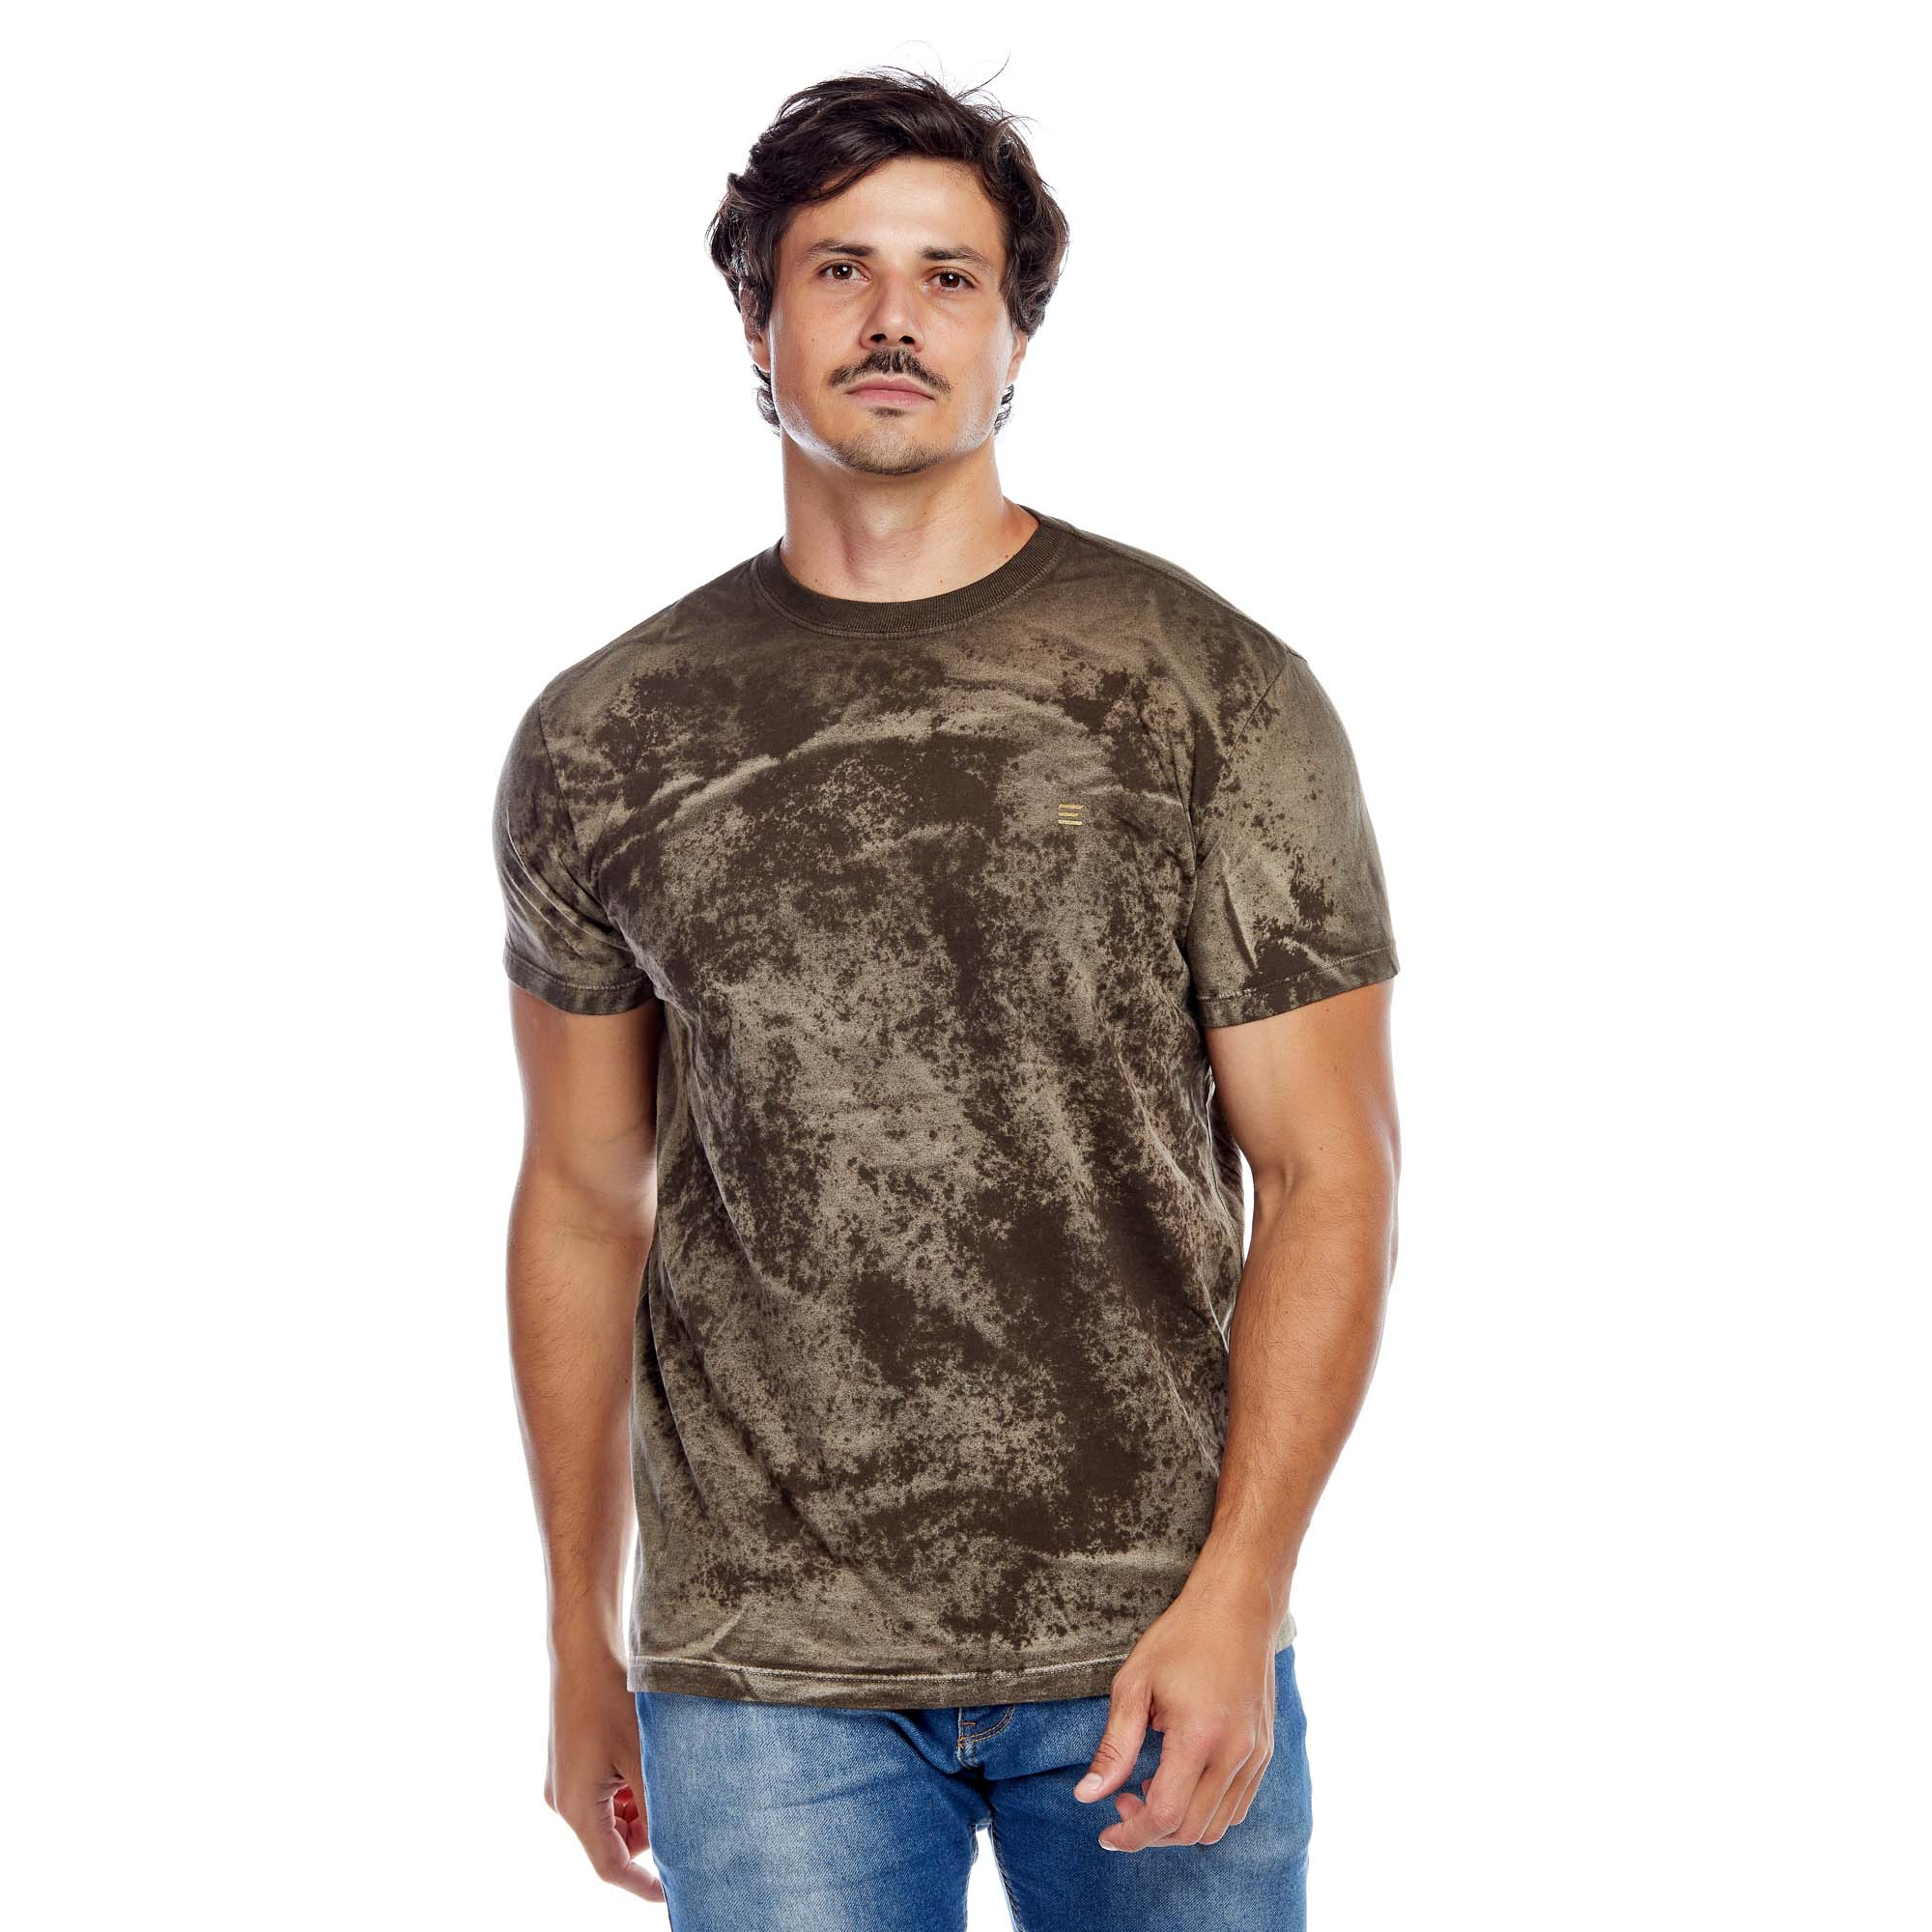 Camiseta Masculina Texturizada Evolvee